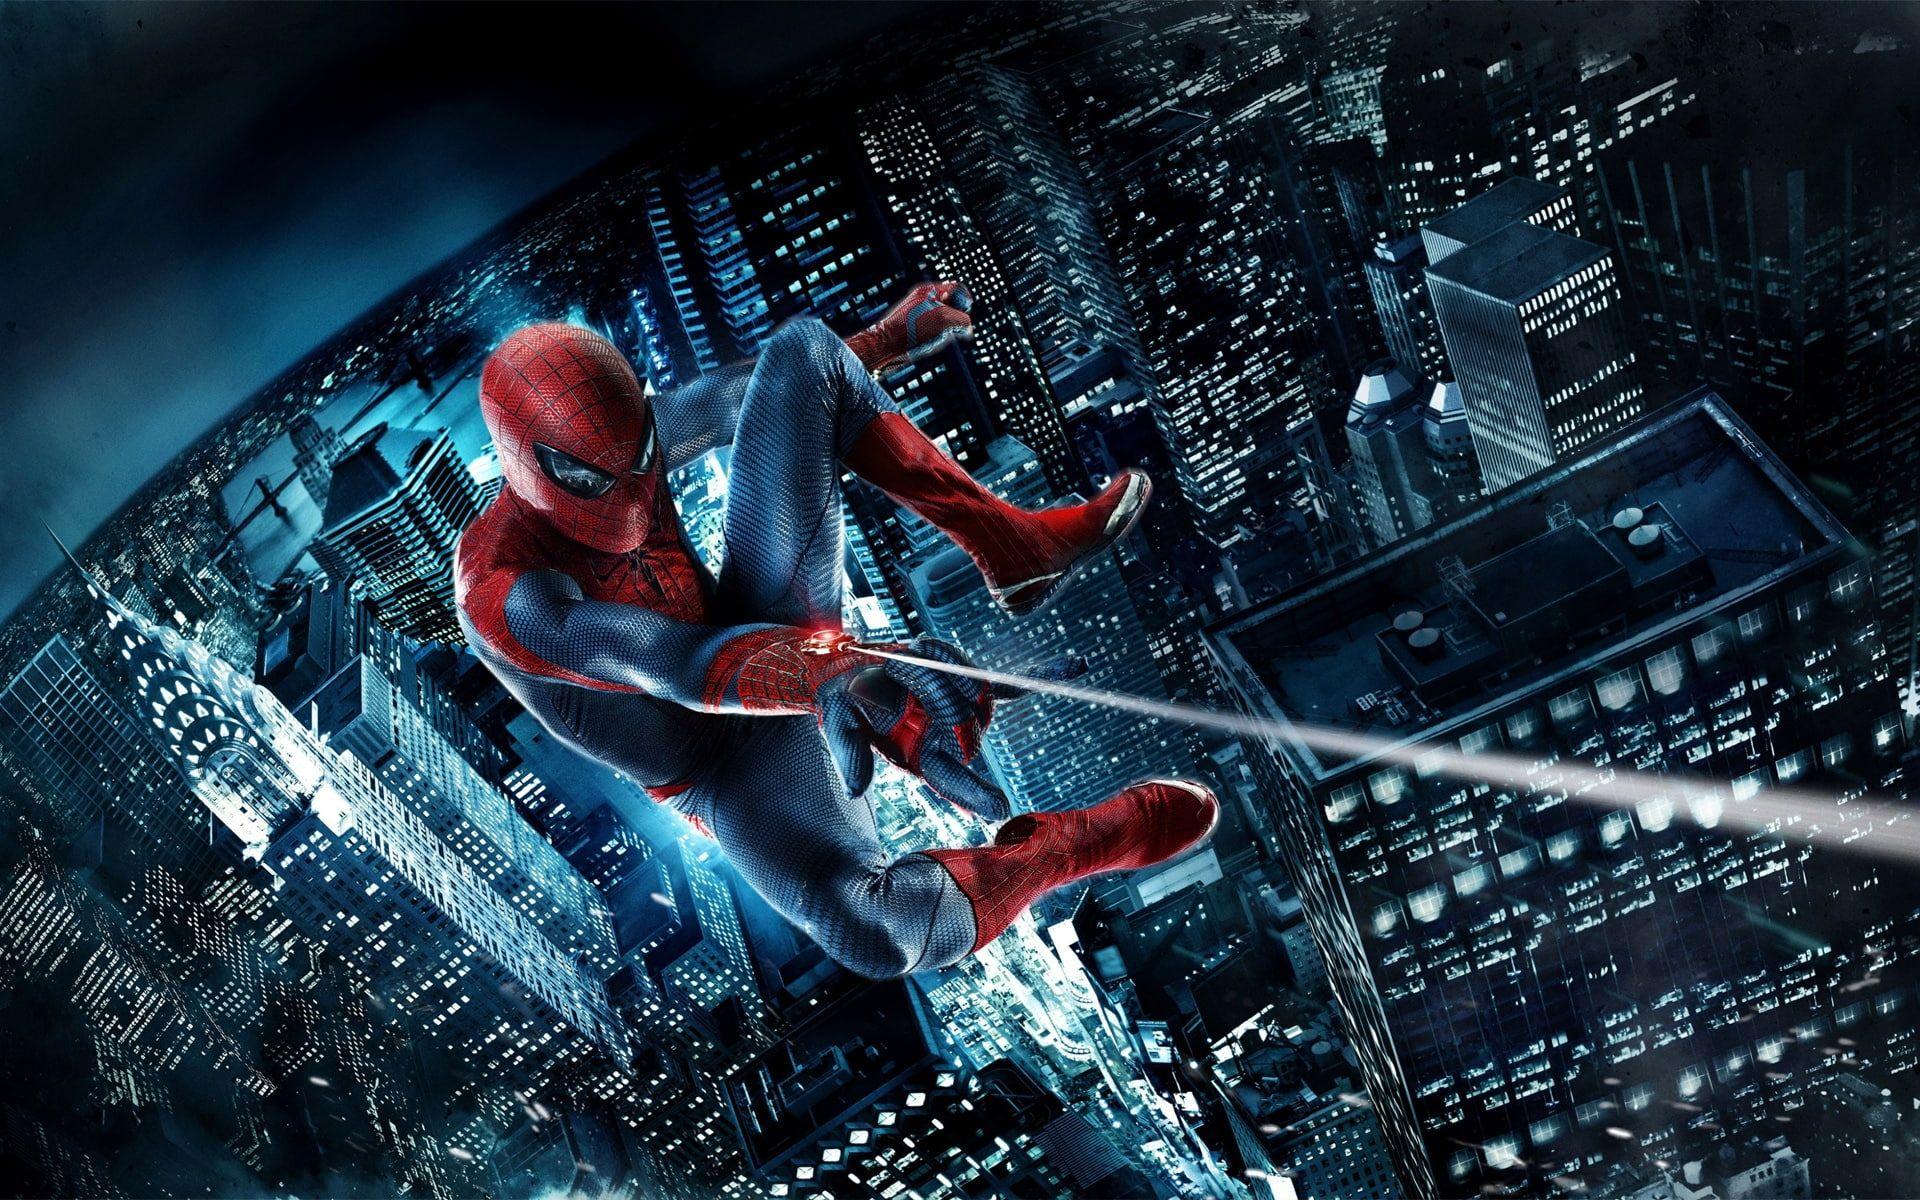 The Amazing Spiderman 2 Movies 2014 Spiderman 1080p Wallpaper Hdwallpaper Desktop In 2021 The Amazing Spiderman 2 Amazing Spiderman Spiderman